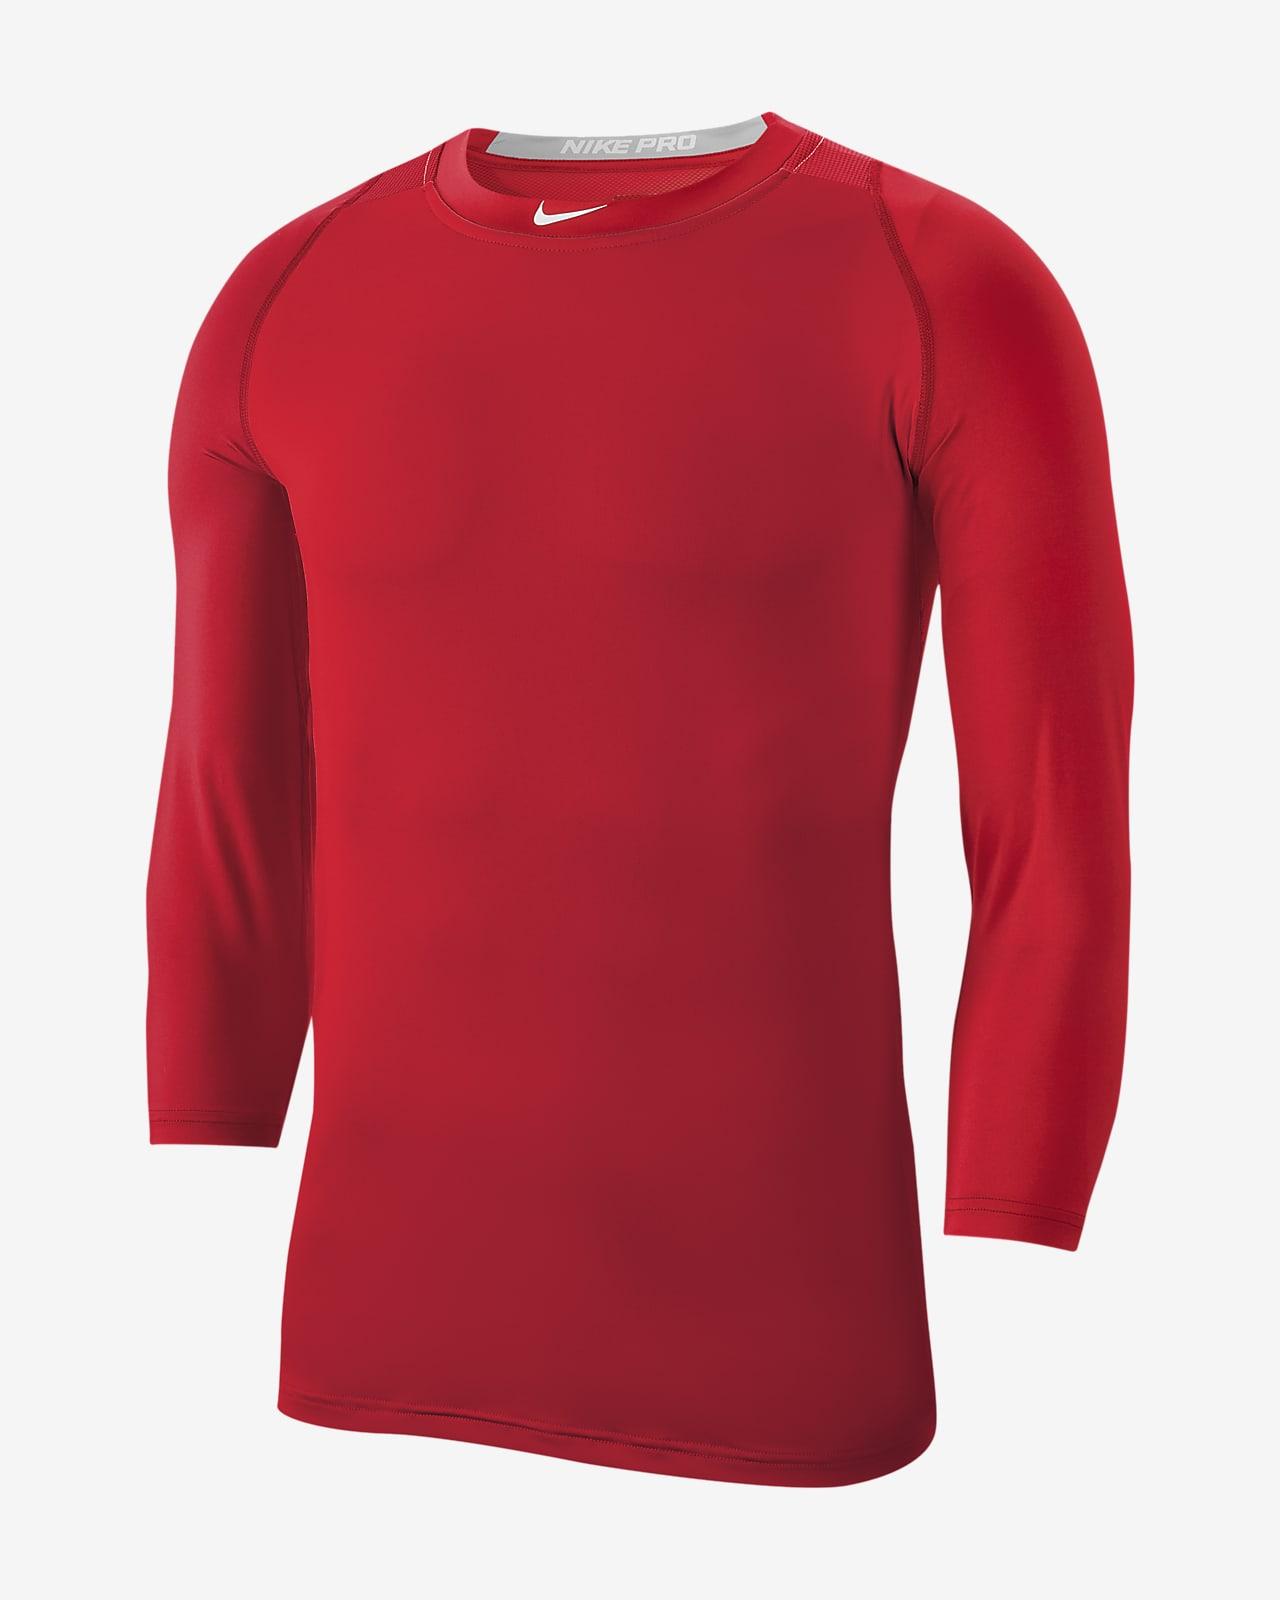 lineal modo tormenta  Nike Pro Men's 3/4 Sleeve Baseball Top. Nike.com